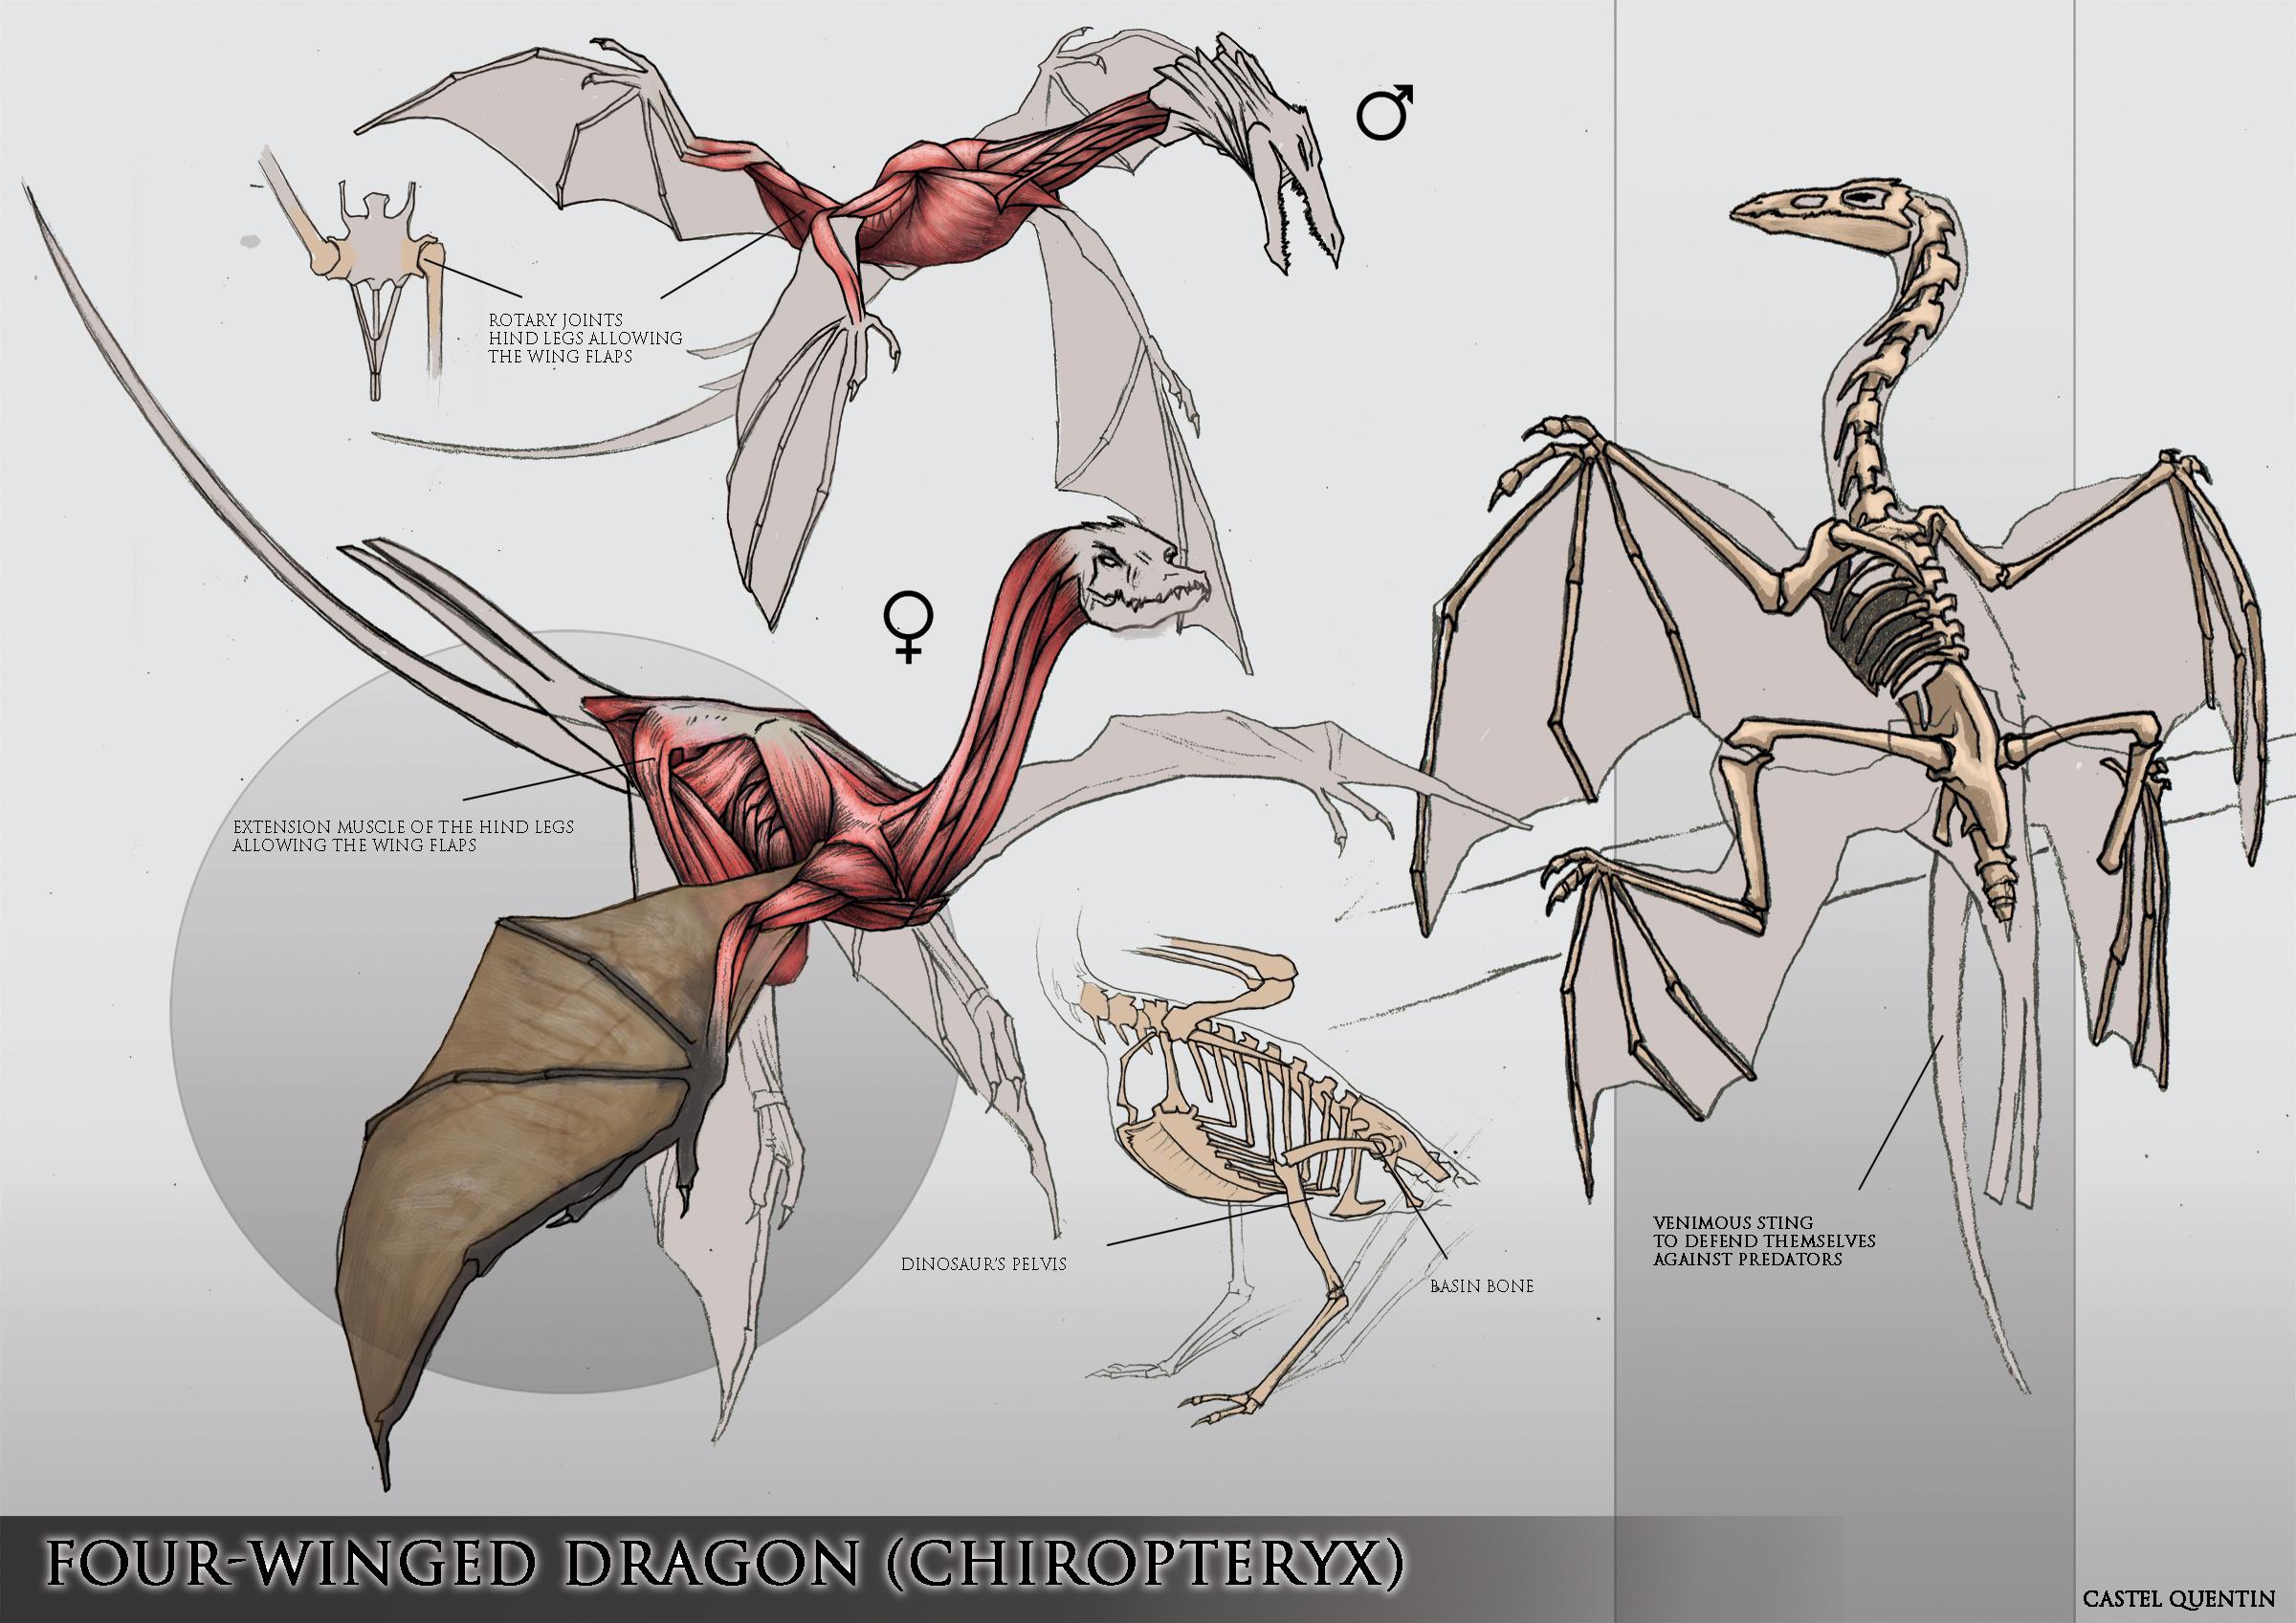 Four-winged dragon anatomy study by Quentinvcastel on DeviantArt